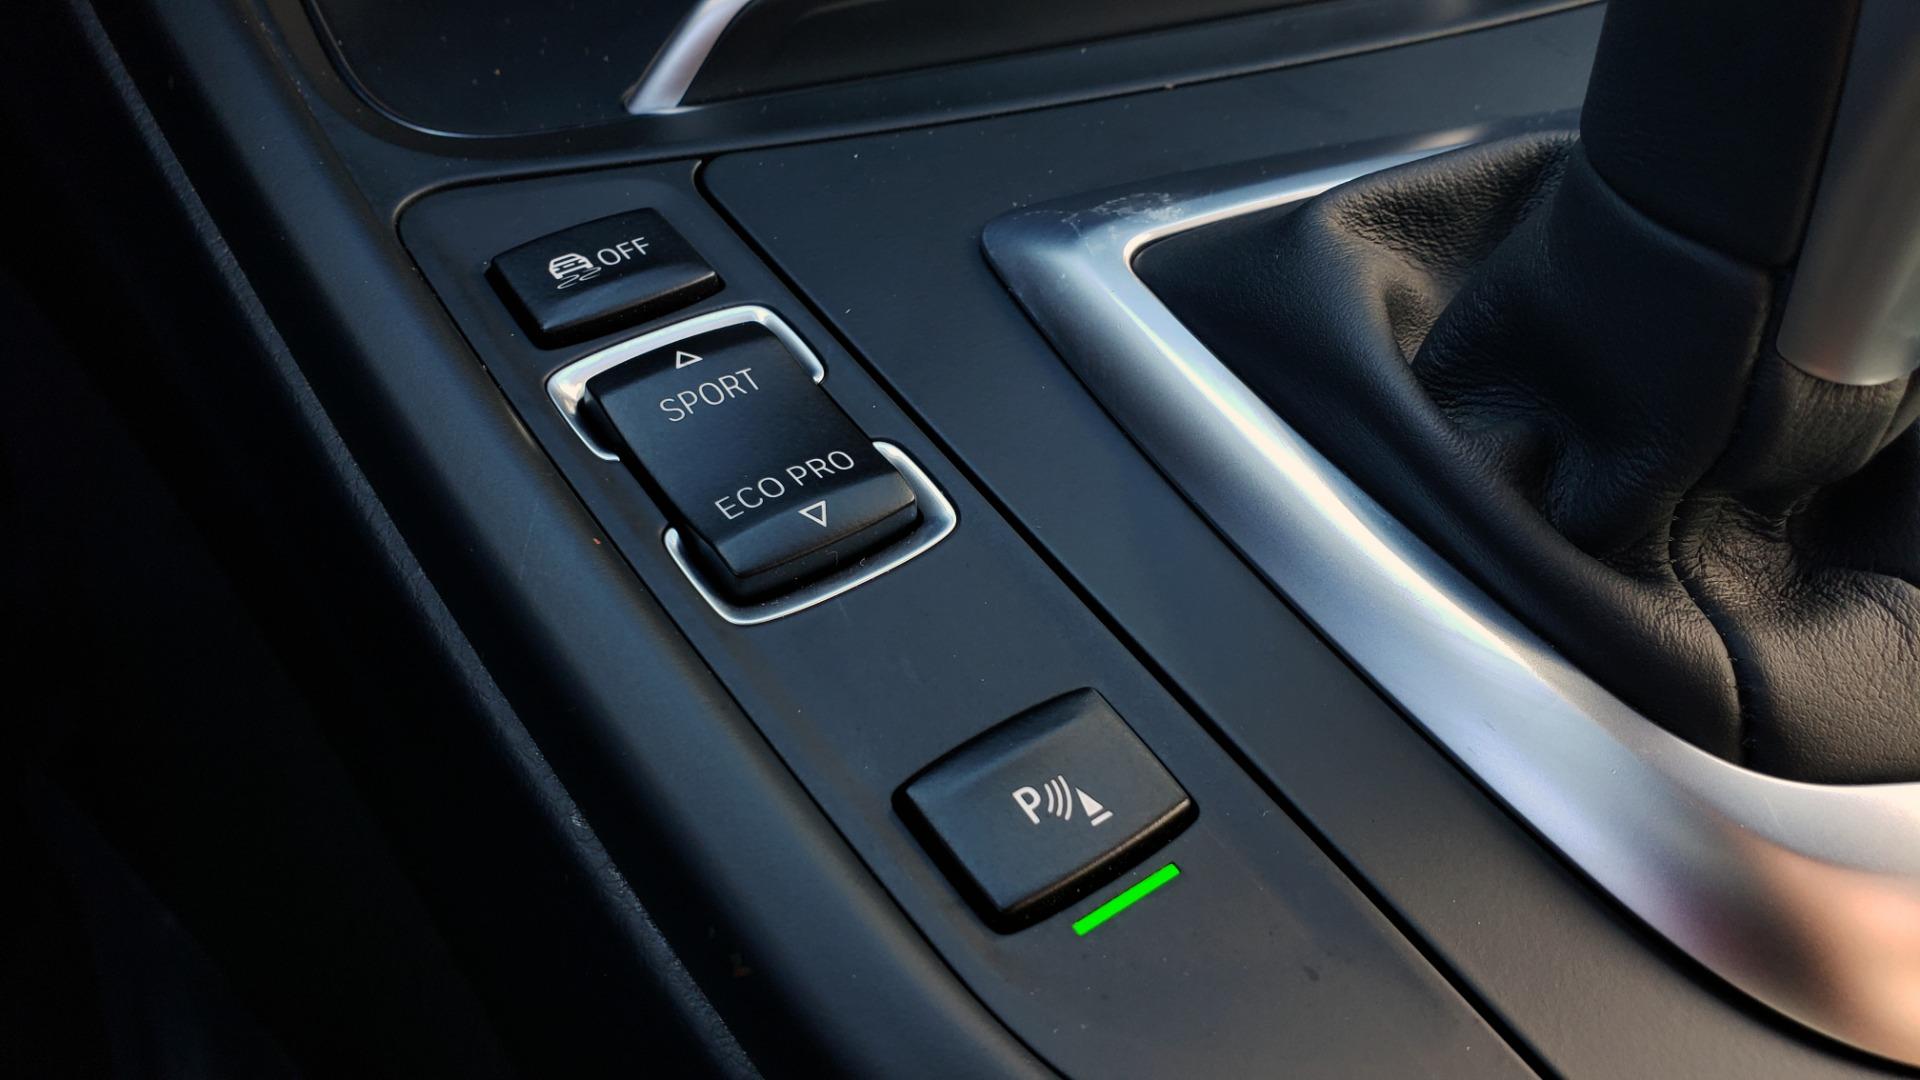 Used 2018 BMW 4 SERIES 430IXDRIVE / PREMIUM / NAV / SUNROOF / ESSENTIALS PKG for sale $28,995 at Formula Imports in Charlotte NC 28227 50